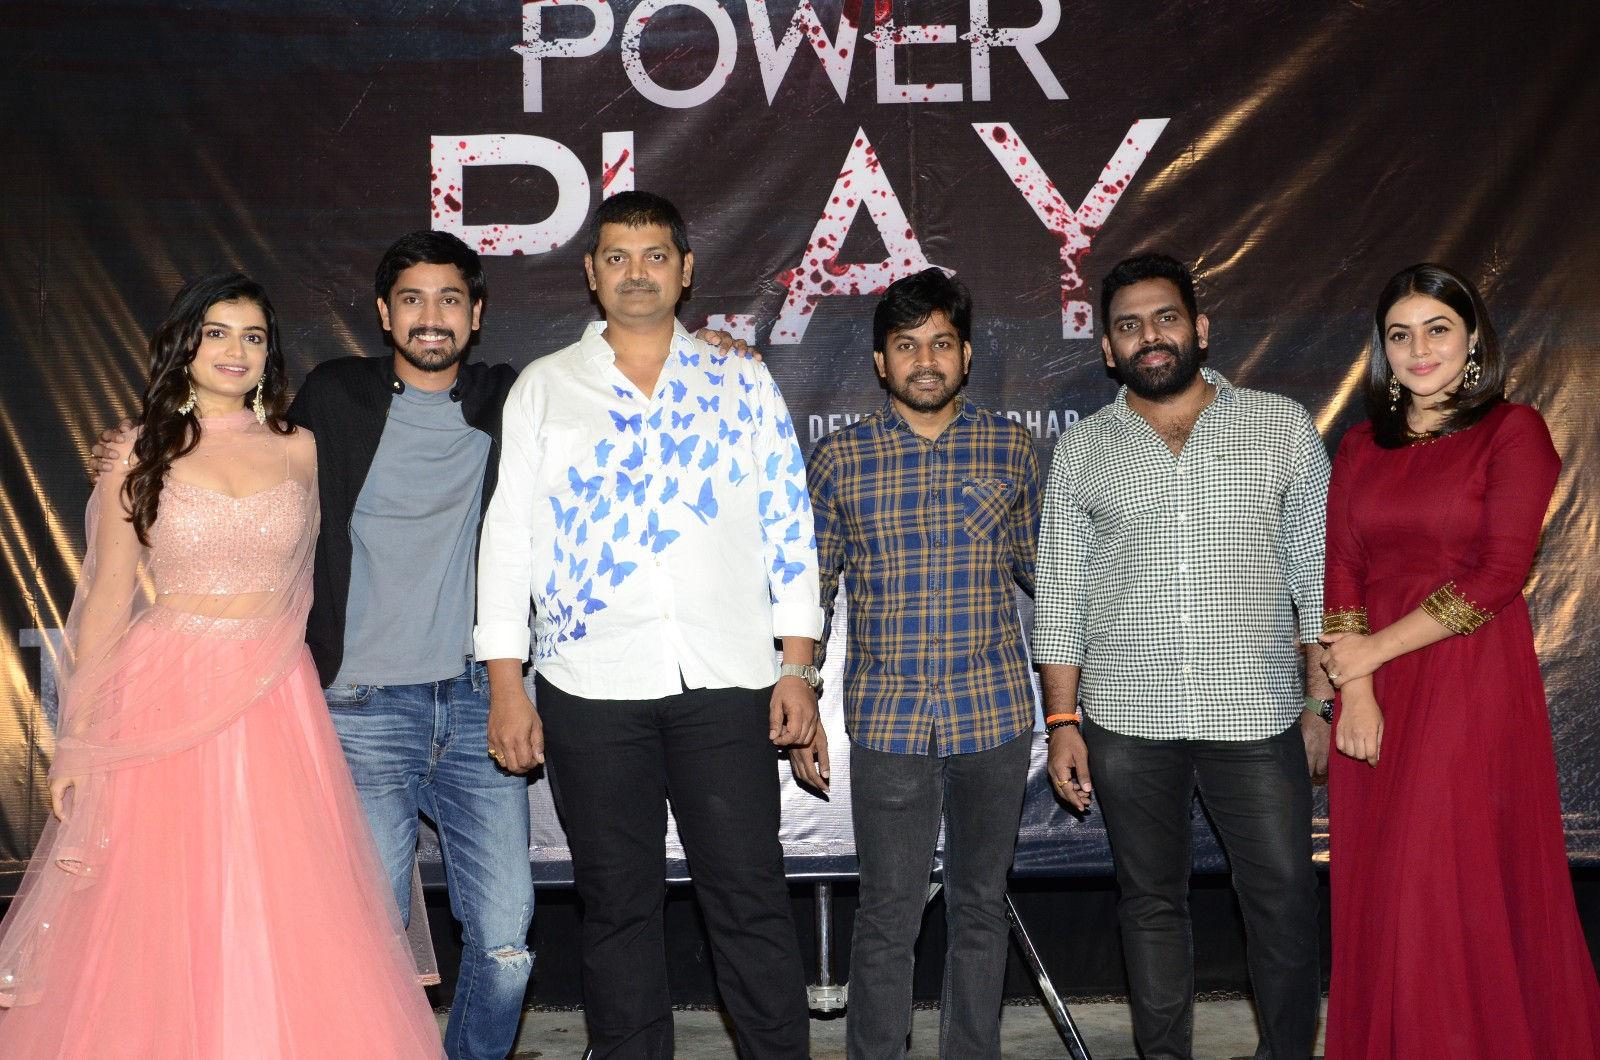 Raj Tarun - Konda Vijaykumar's 'Power Play' Is Garnering Very Good Response In Amazon Prime